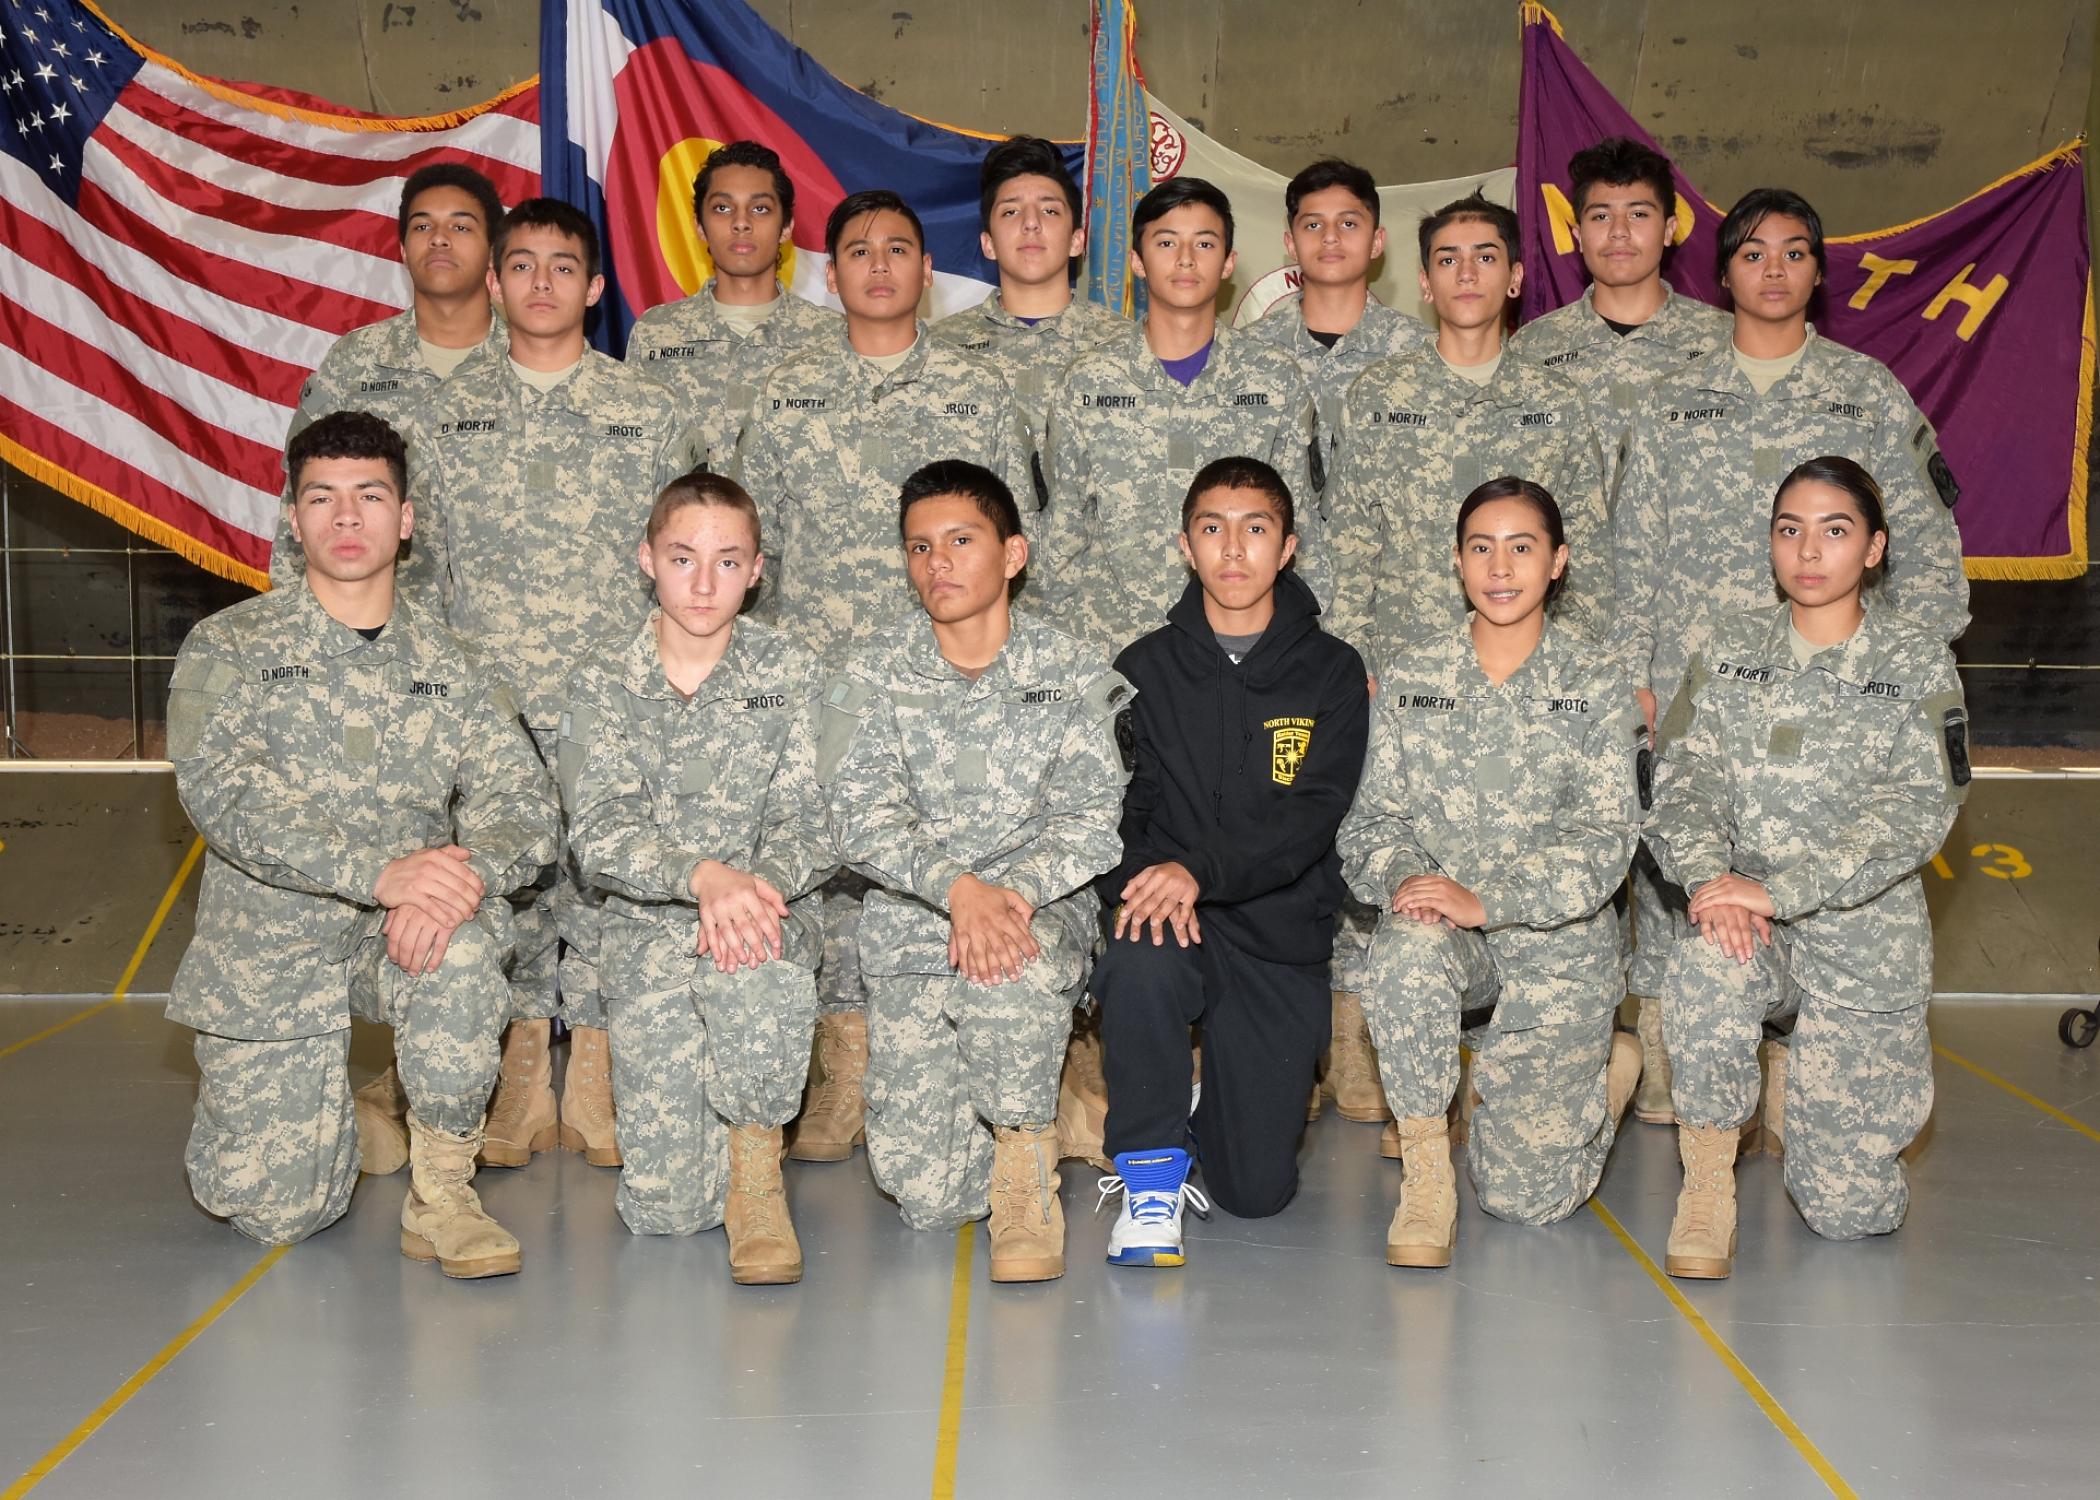 2017-2018 Raider Team